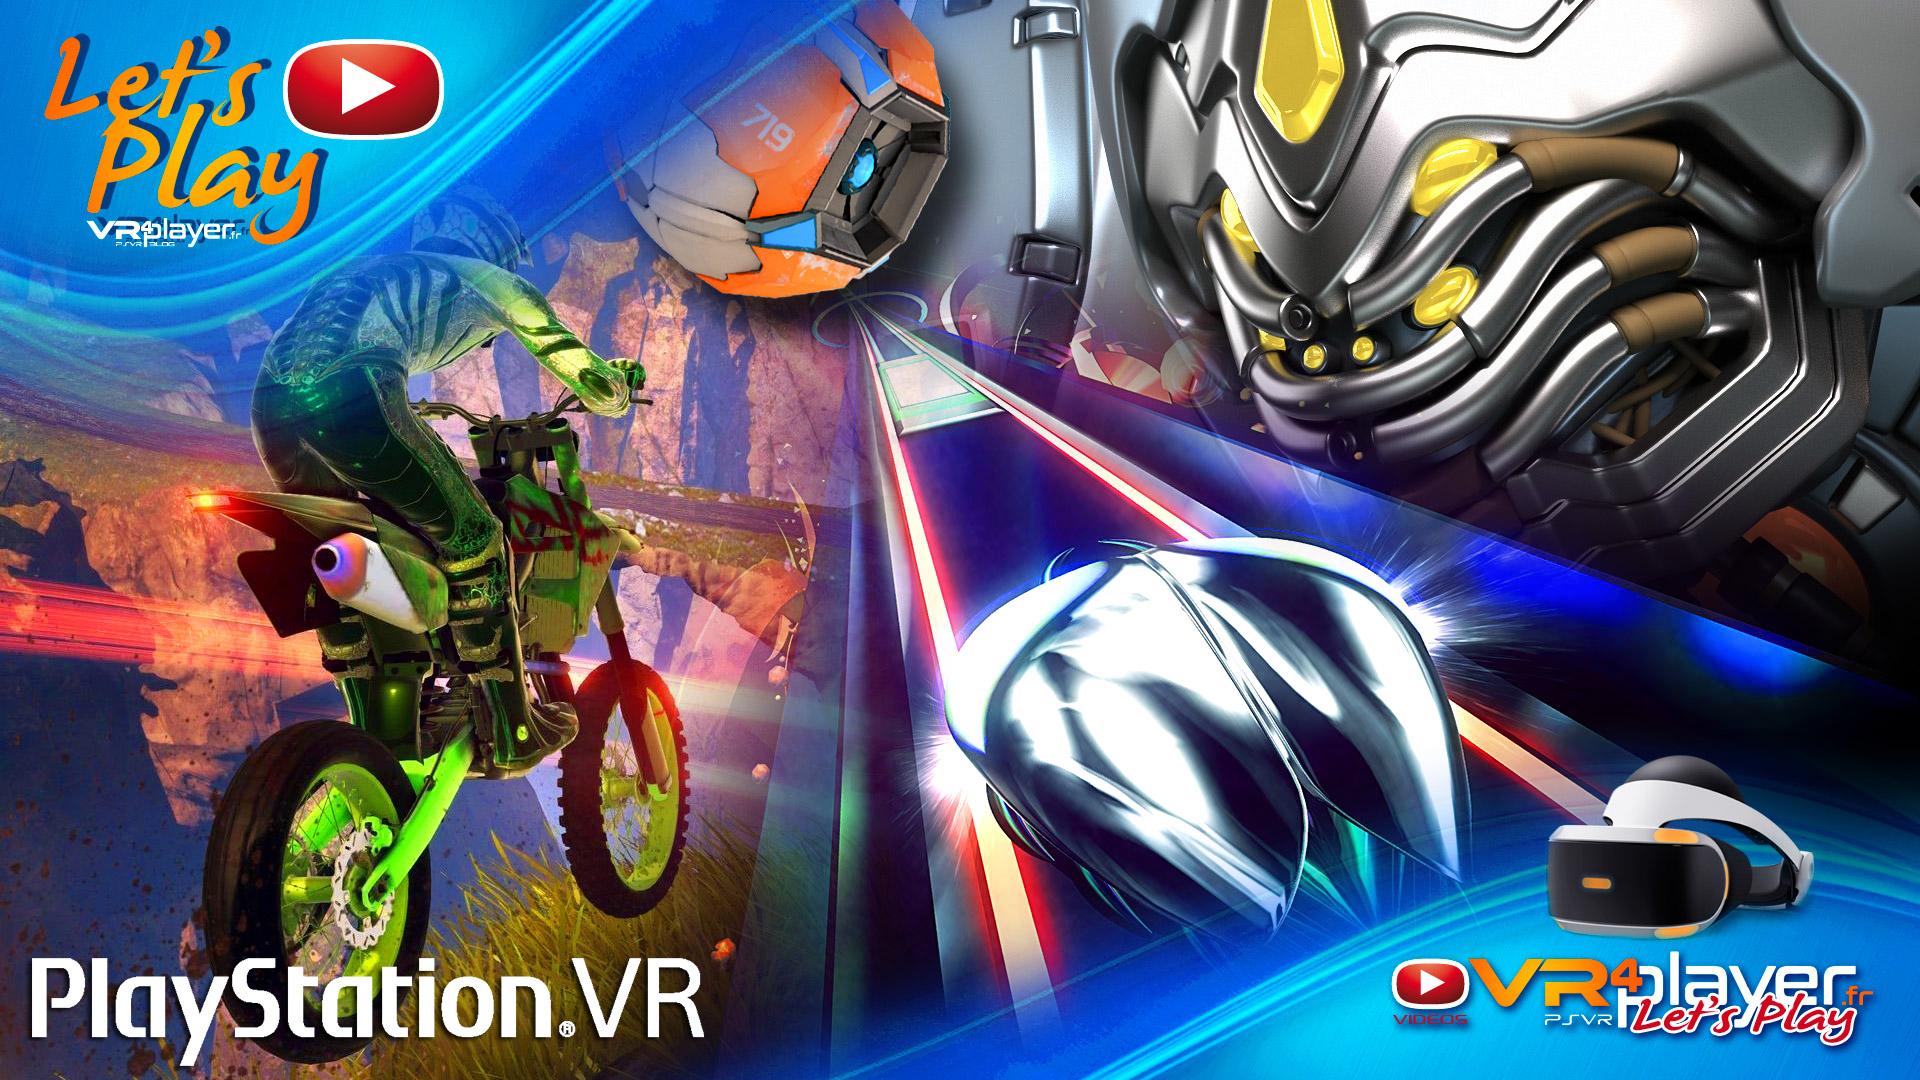 let's play PlayStation VR - VR4player.fr